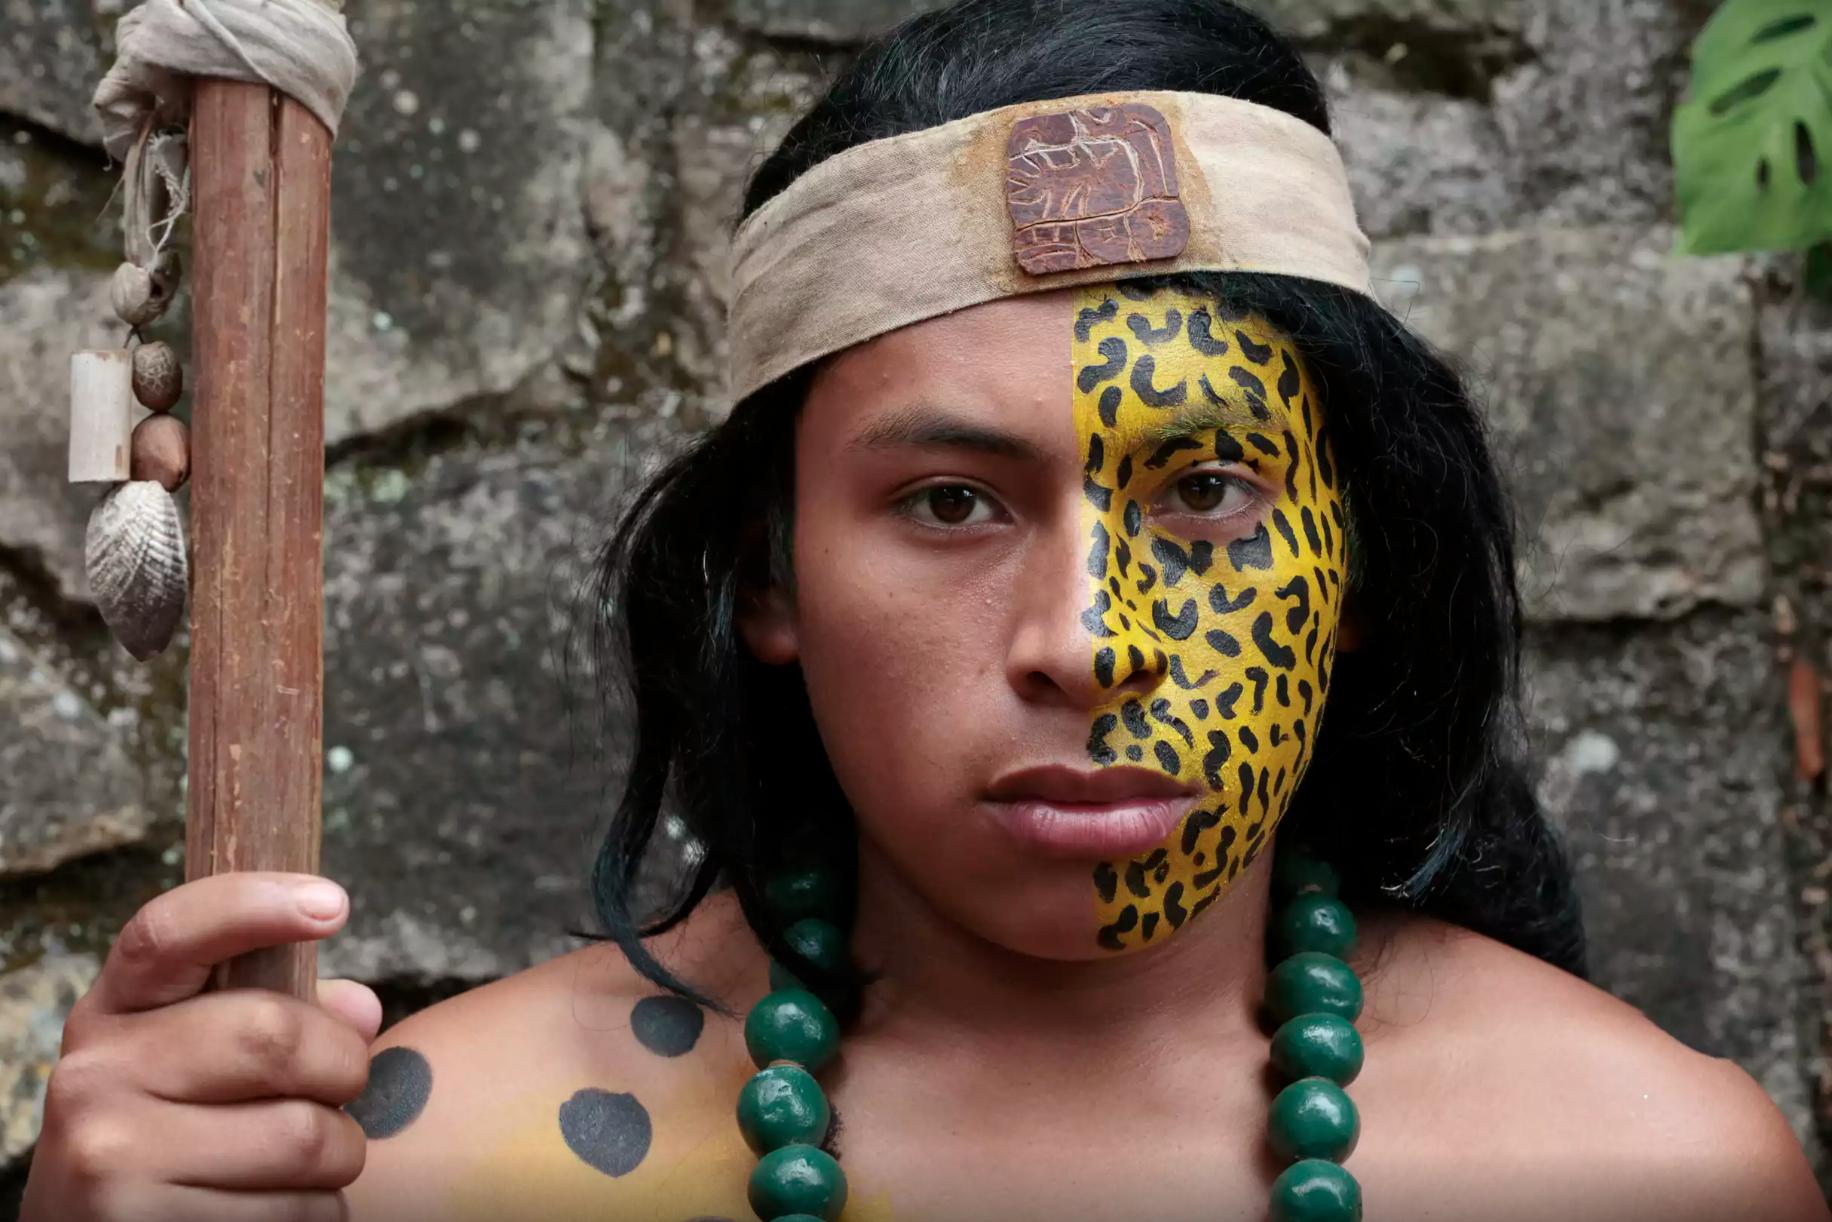 A young indigenous man in Honduras painted as a jaguar. (Photo UN)